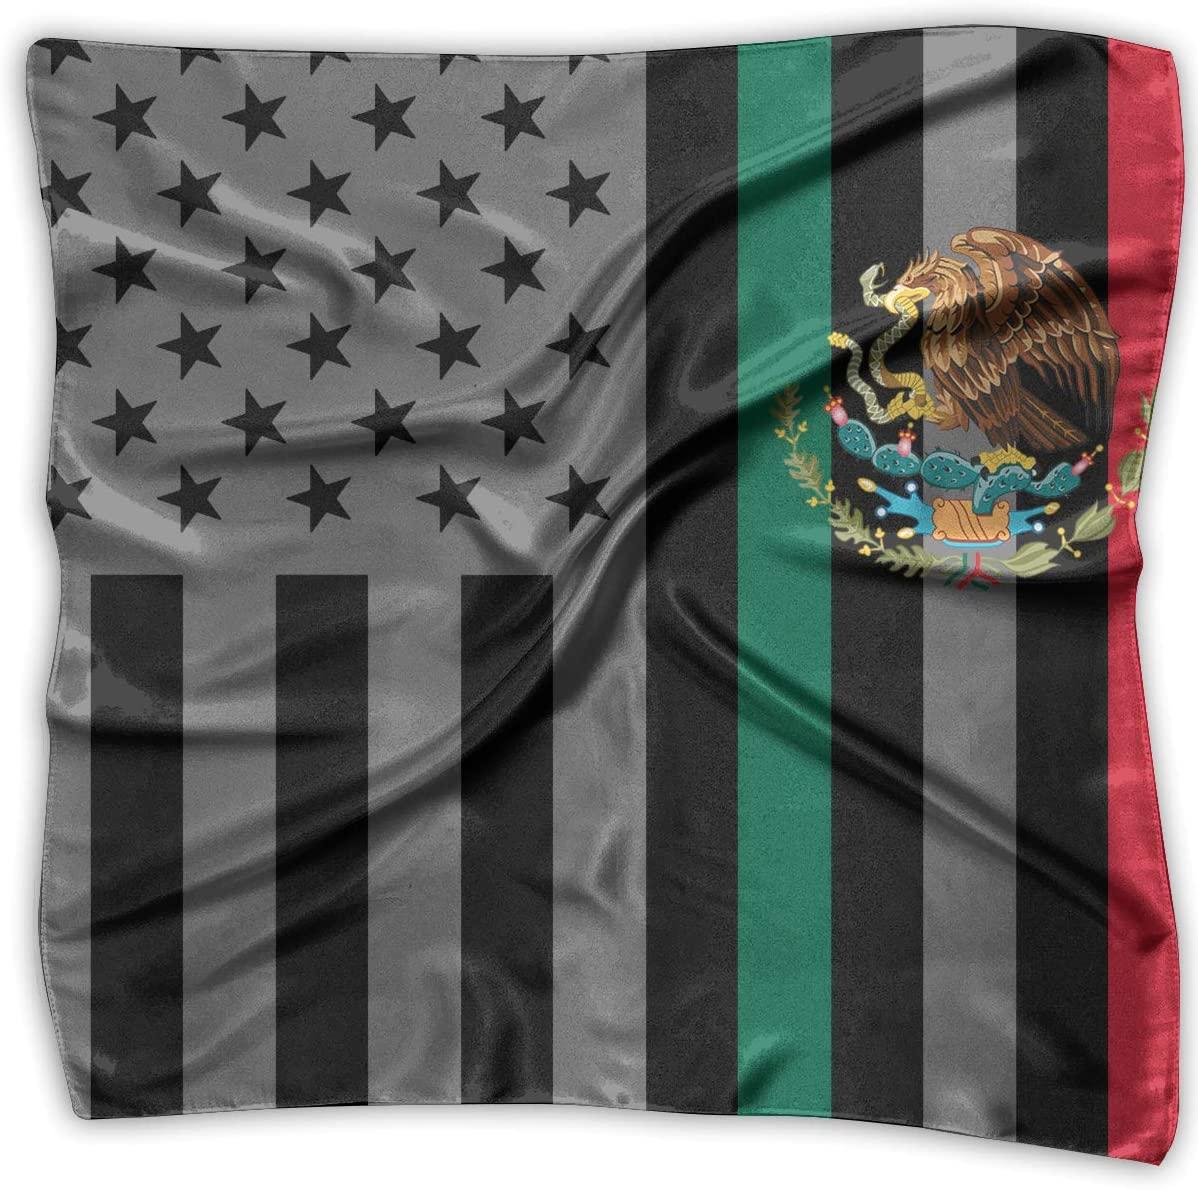 WFIRE American Mexico Flag Square Handkerchiefs Scarf Shawl Bandanas Headscarf Neckerchief Tie Hair Scarf